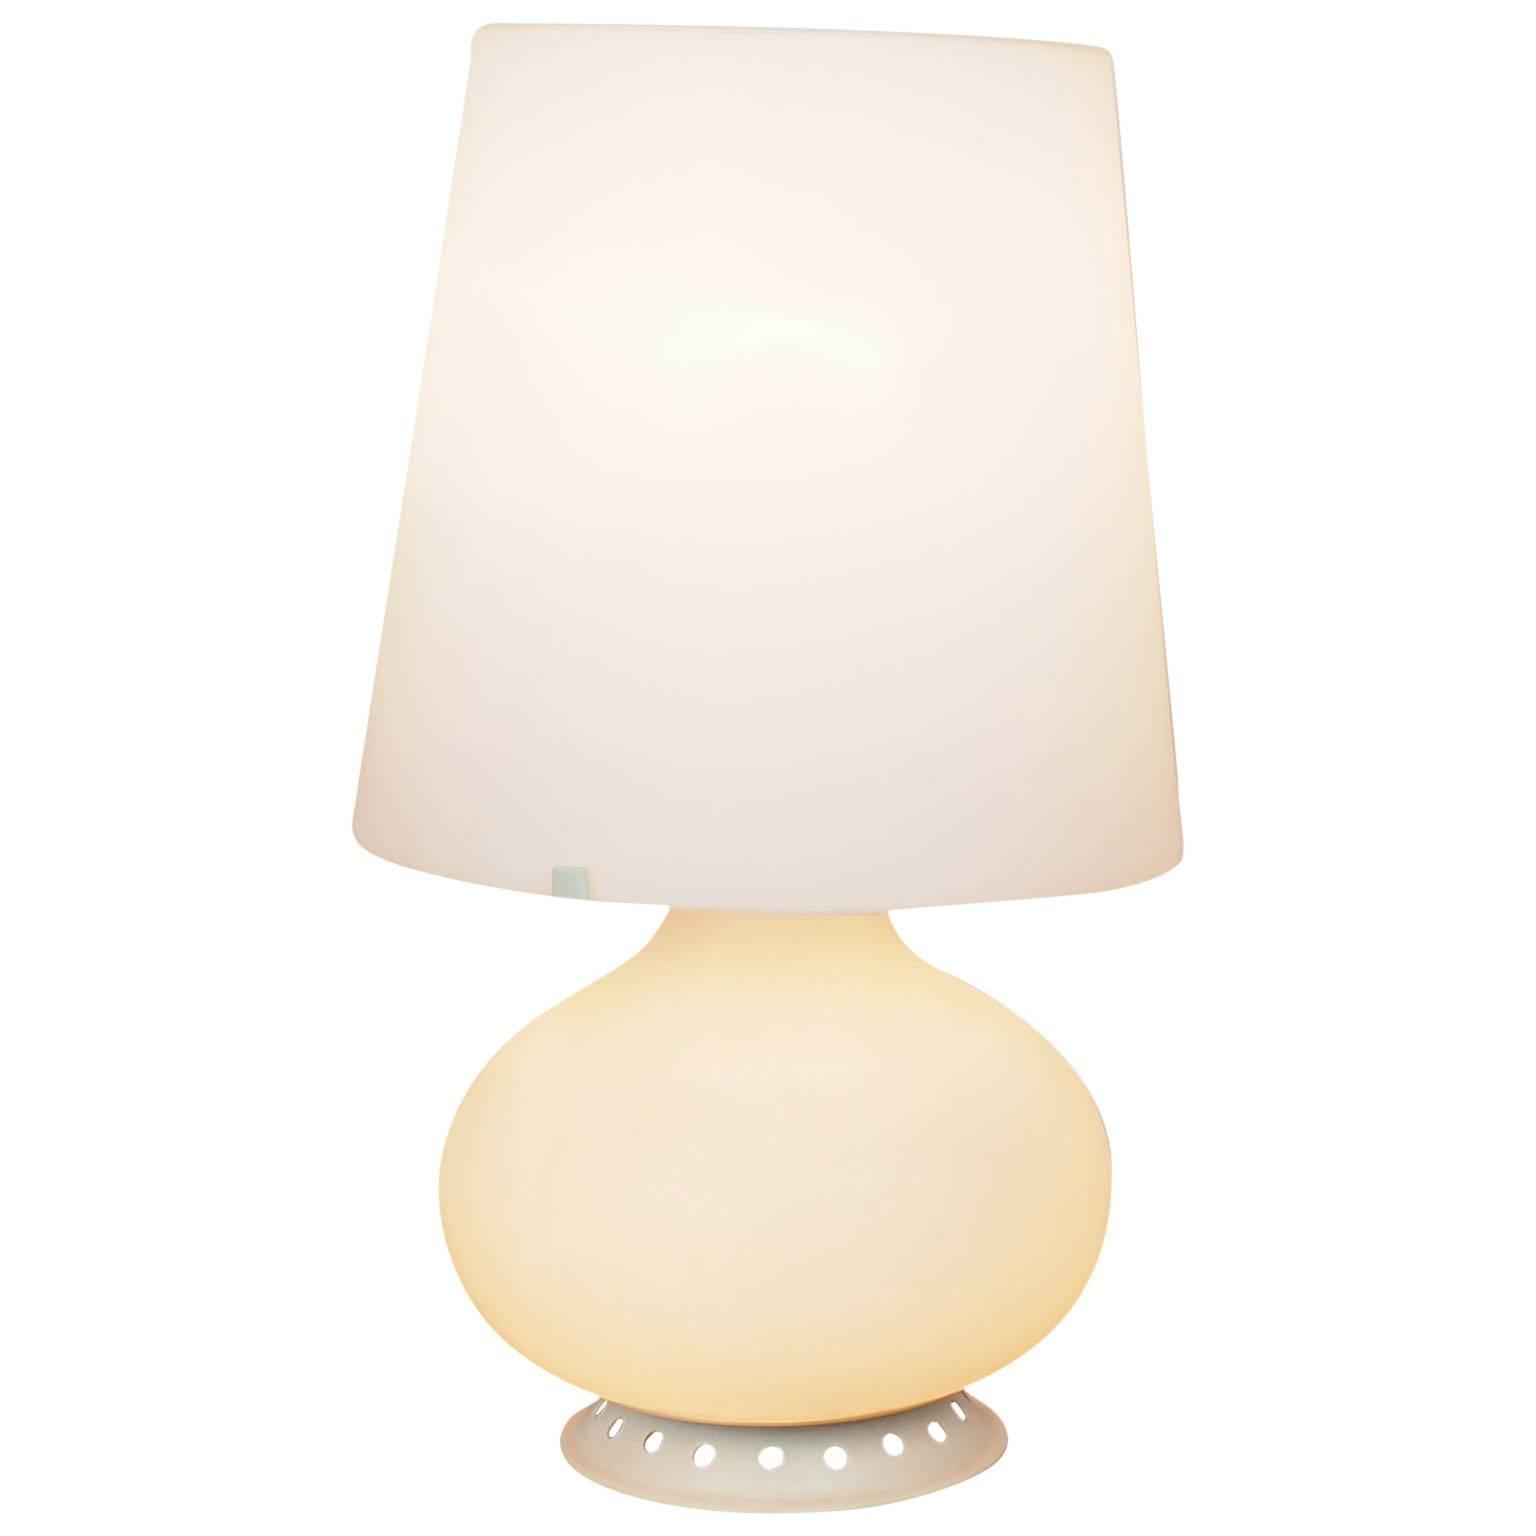 Max Ingrand Iconic Table Lamp Designed for Fontana Arte, Milano ...